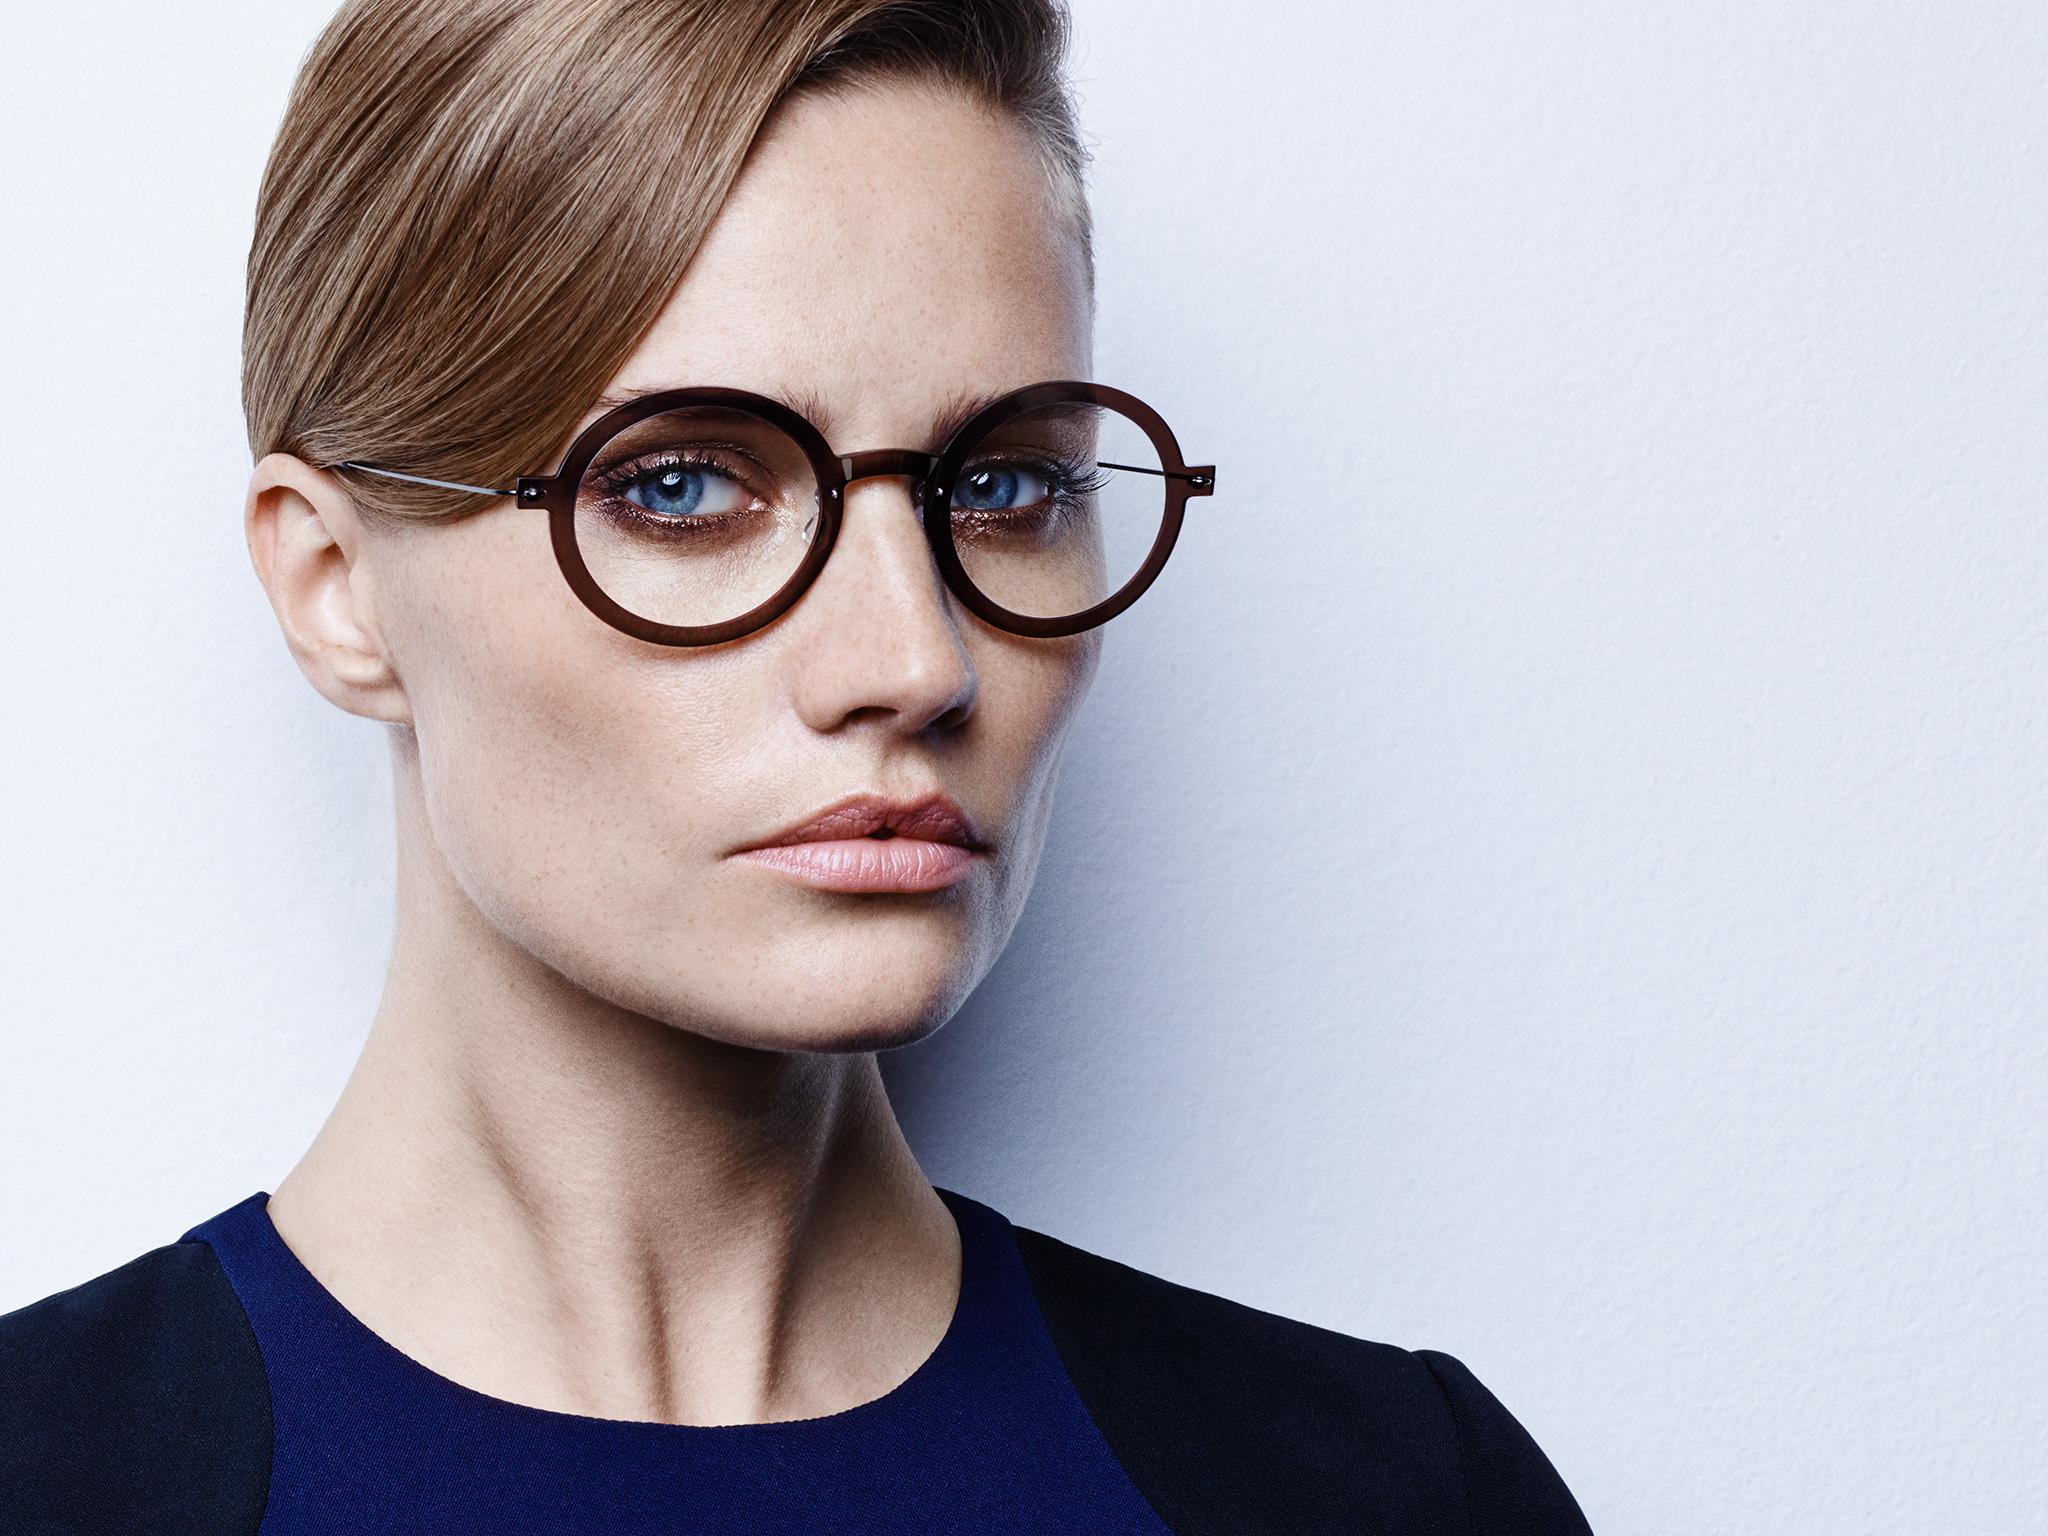 b8fef69164931e lunettes lindberg titane femme